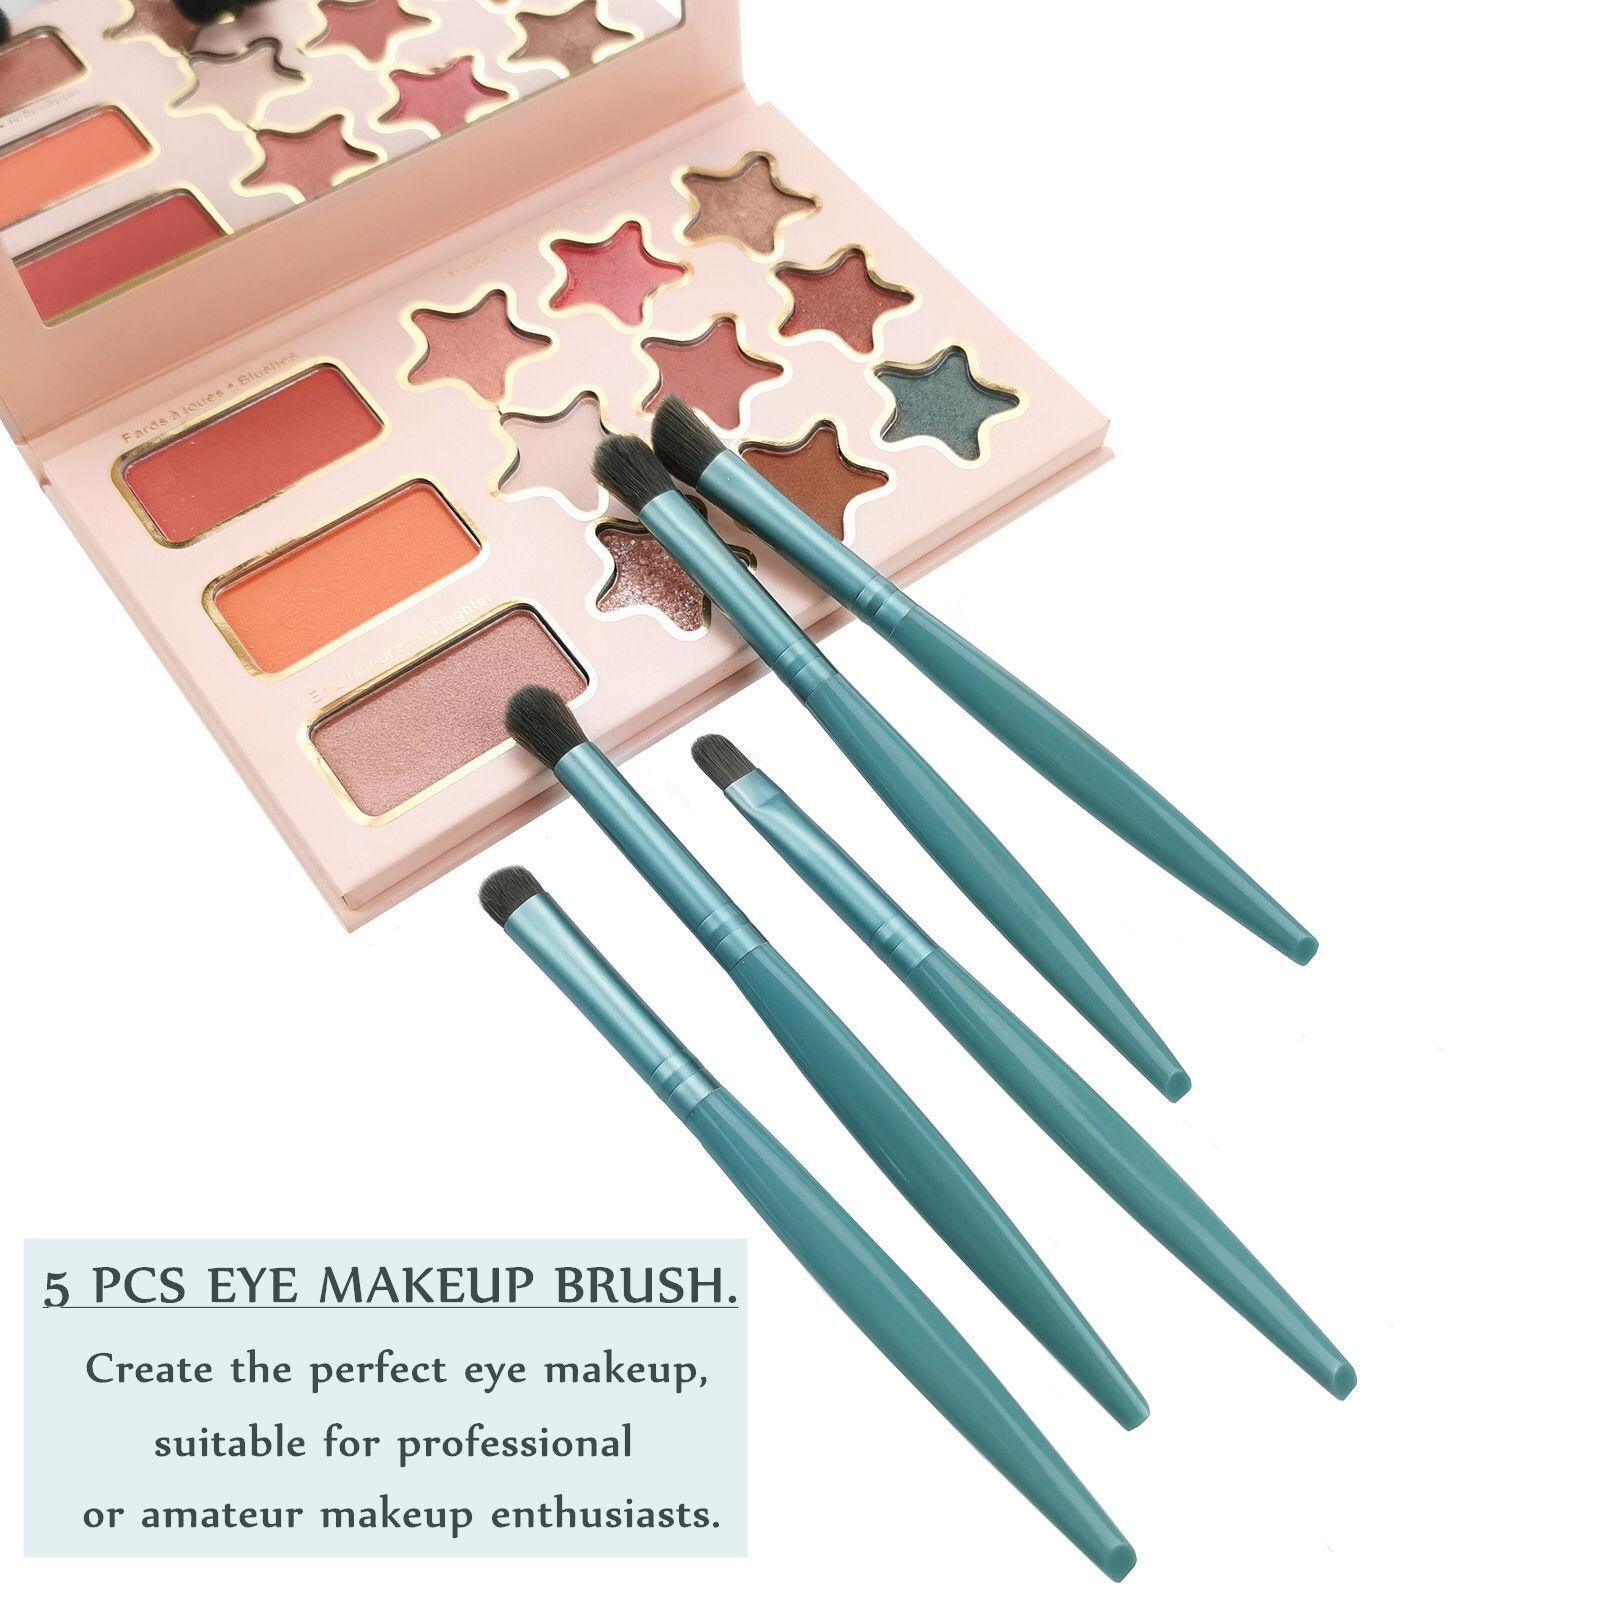 Ultra soft portable mini eye shadow brush nose brush eyebrow brush lip brush smudge brush set in 5pc